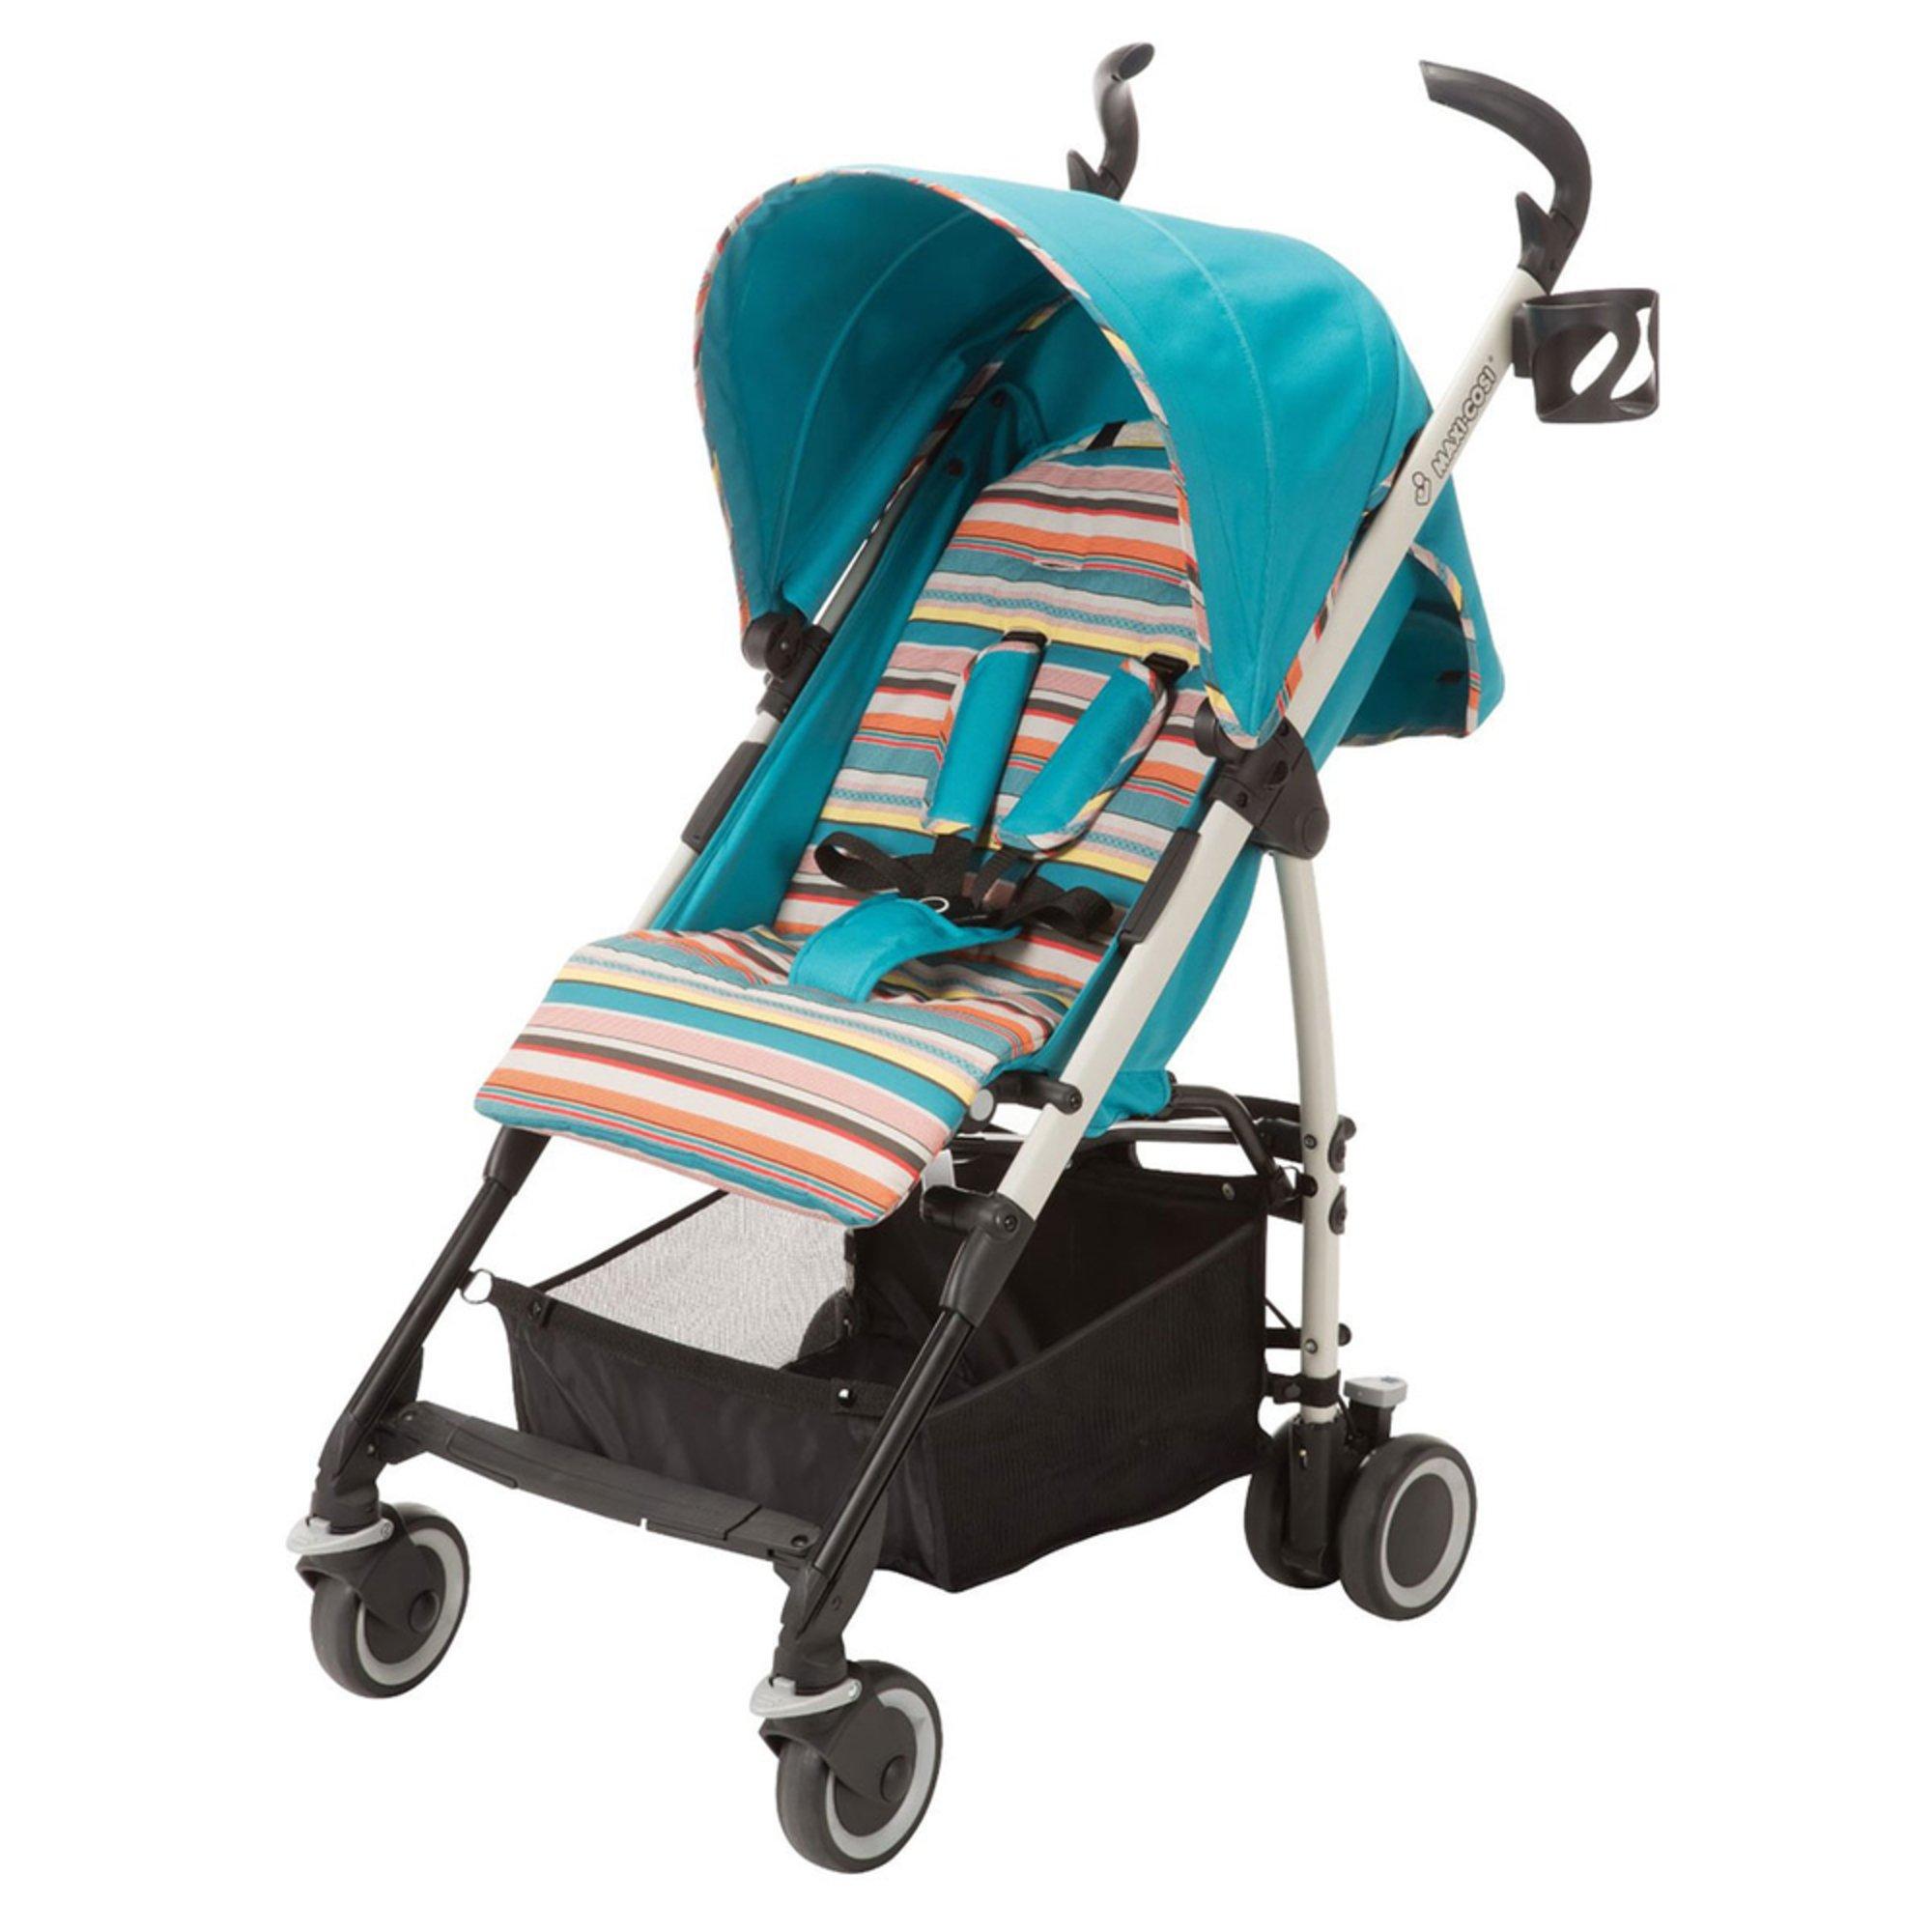 Maxi-cosi Kaia Stroller, Bohemian Blue | Lightweight ...